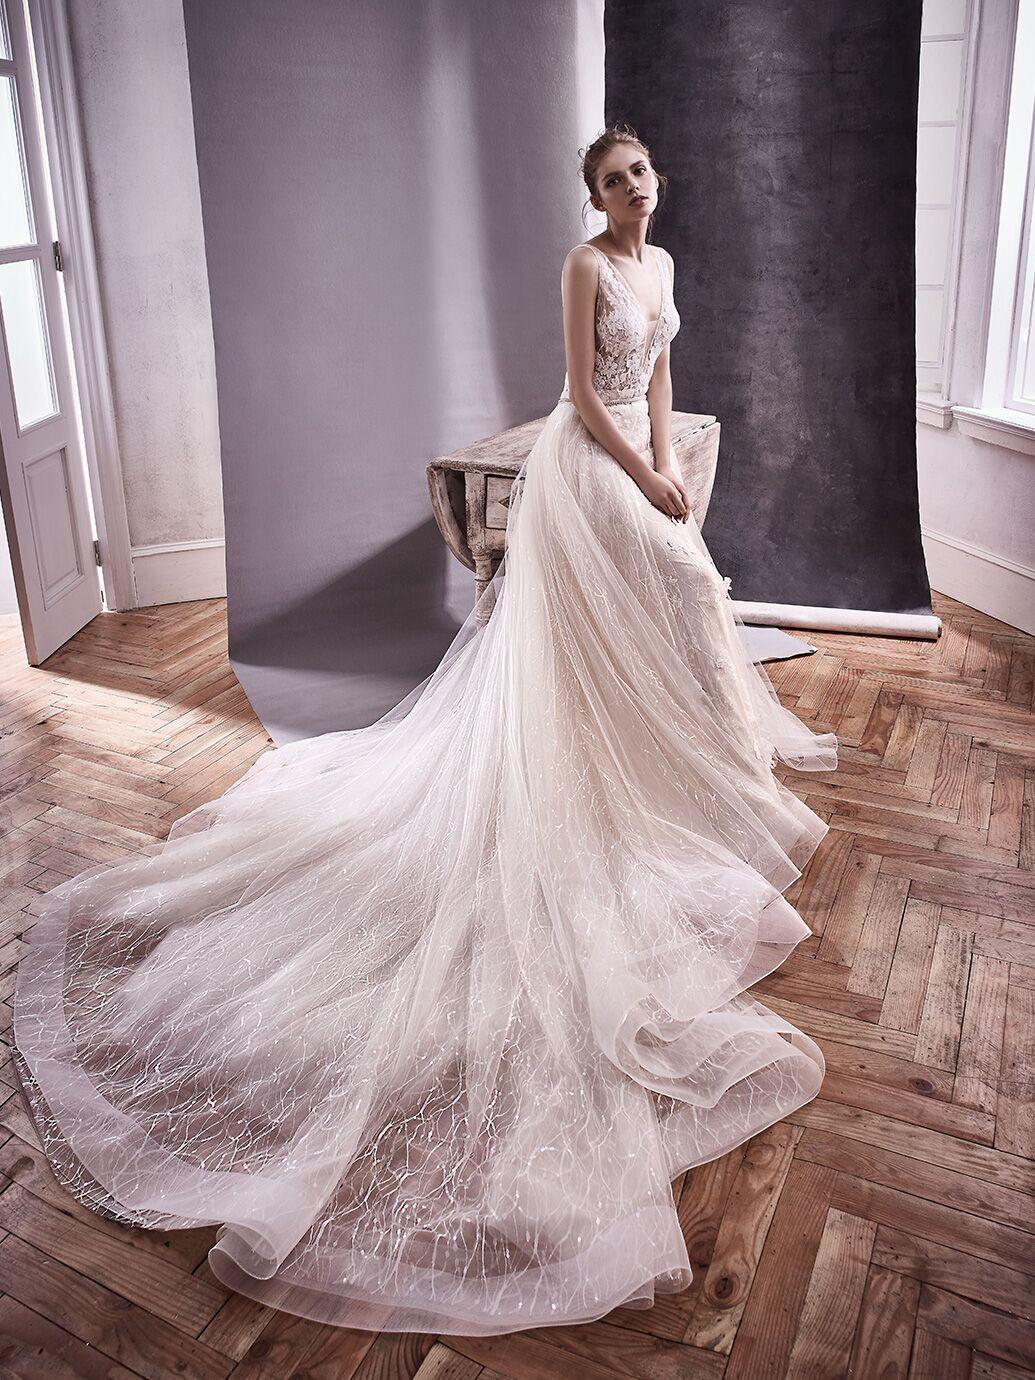 Dimitra S Bridal Couture Bridal Salons Chicago Il